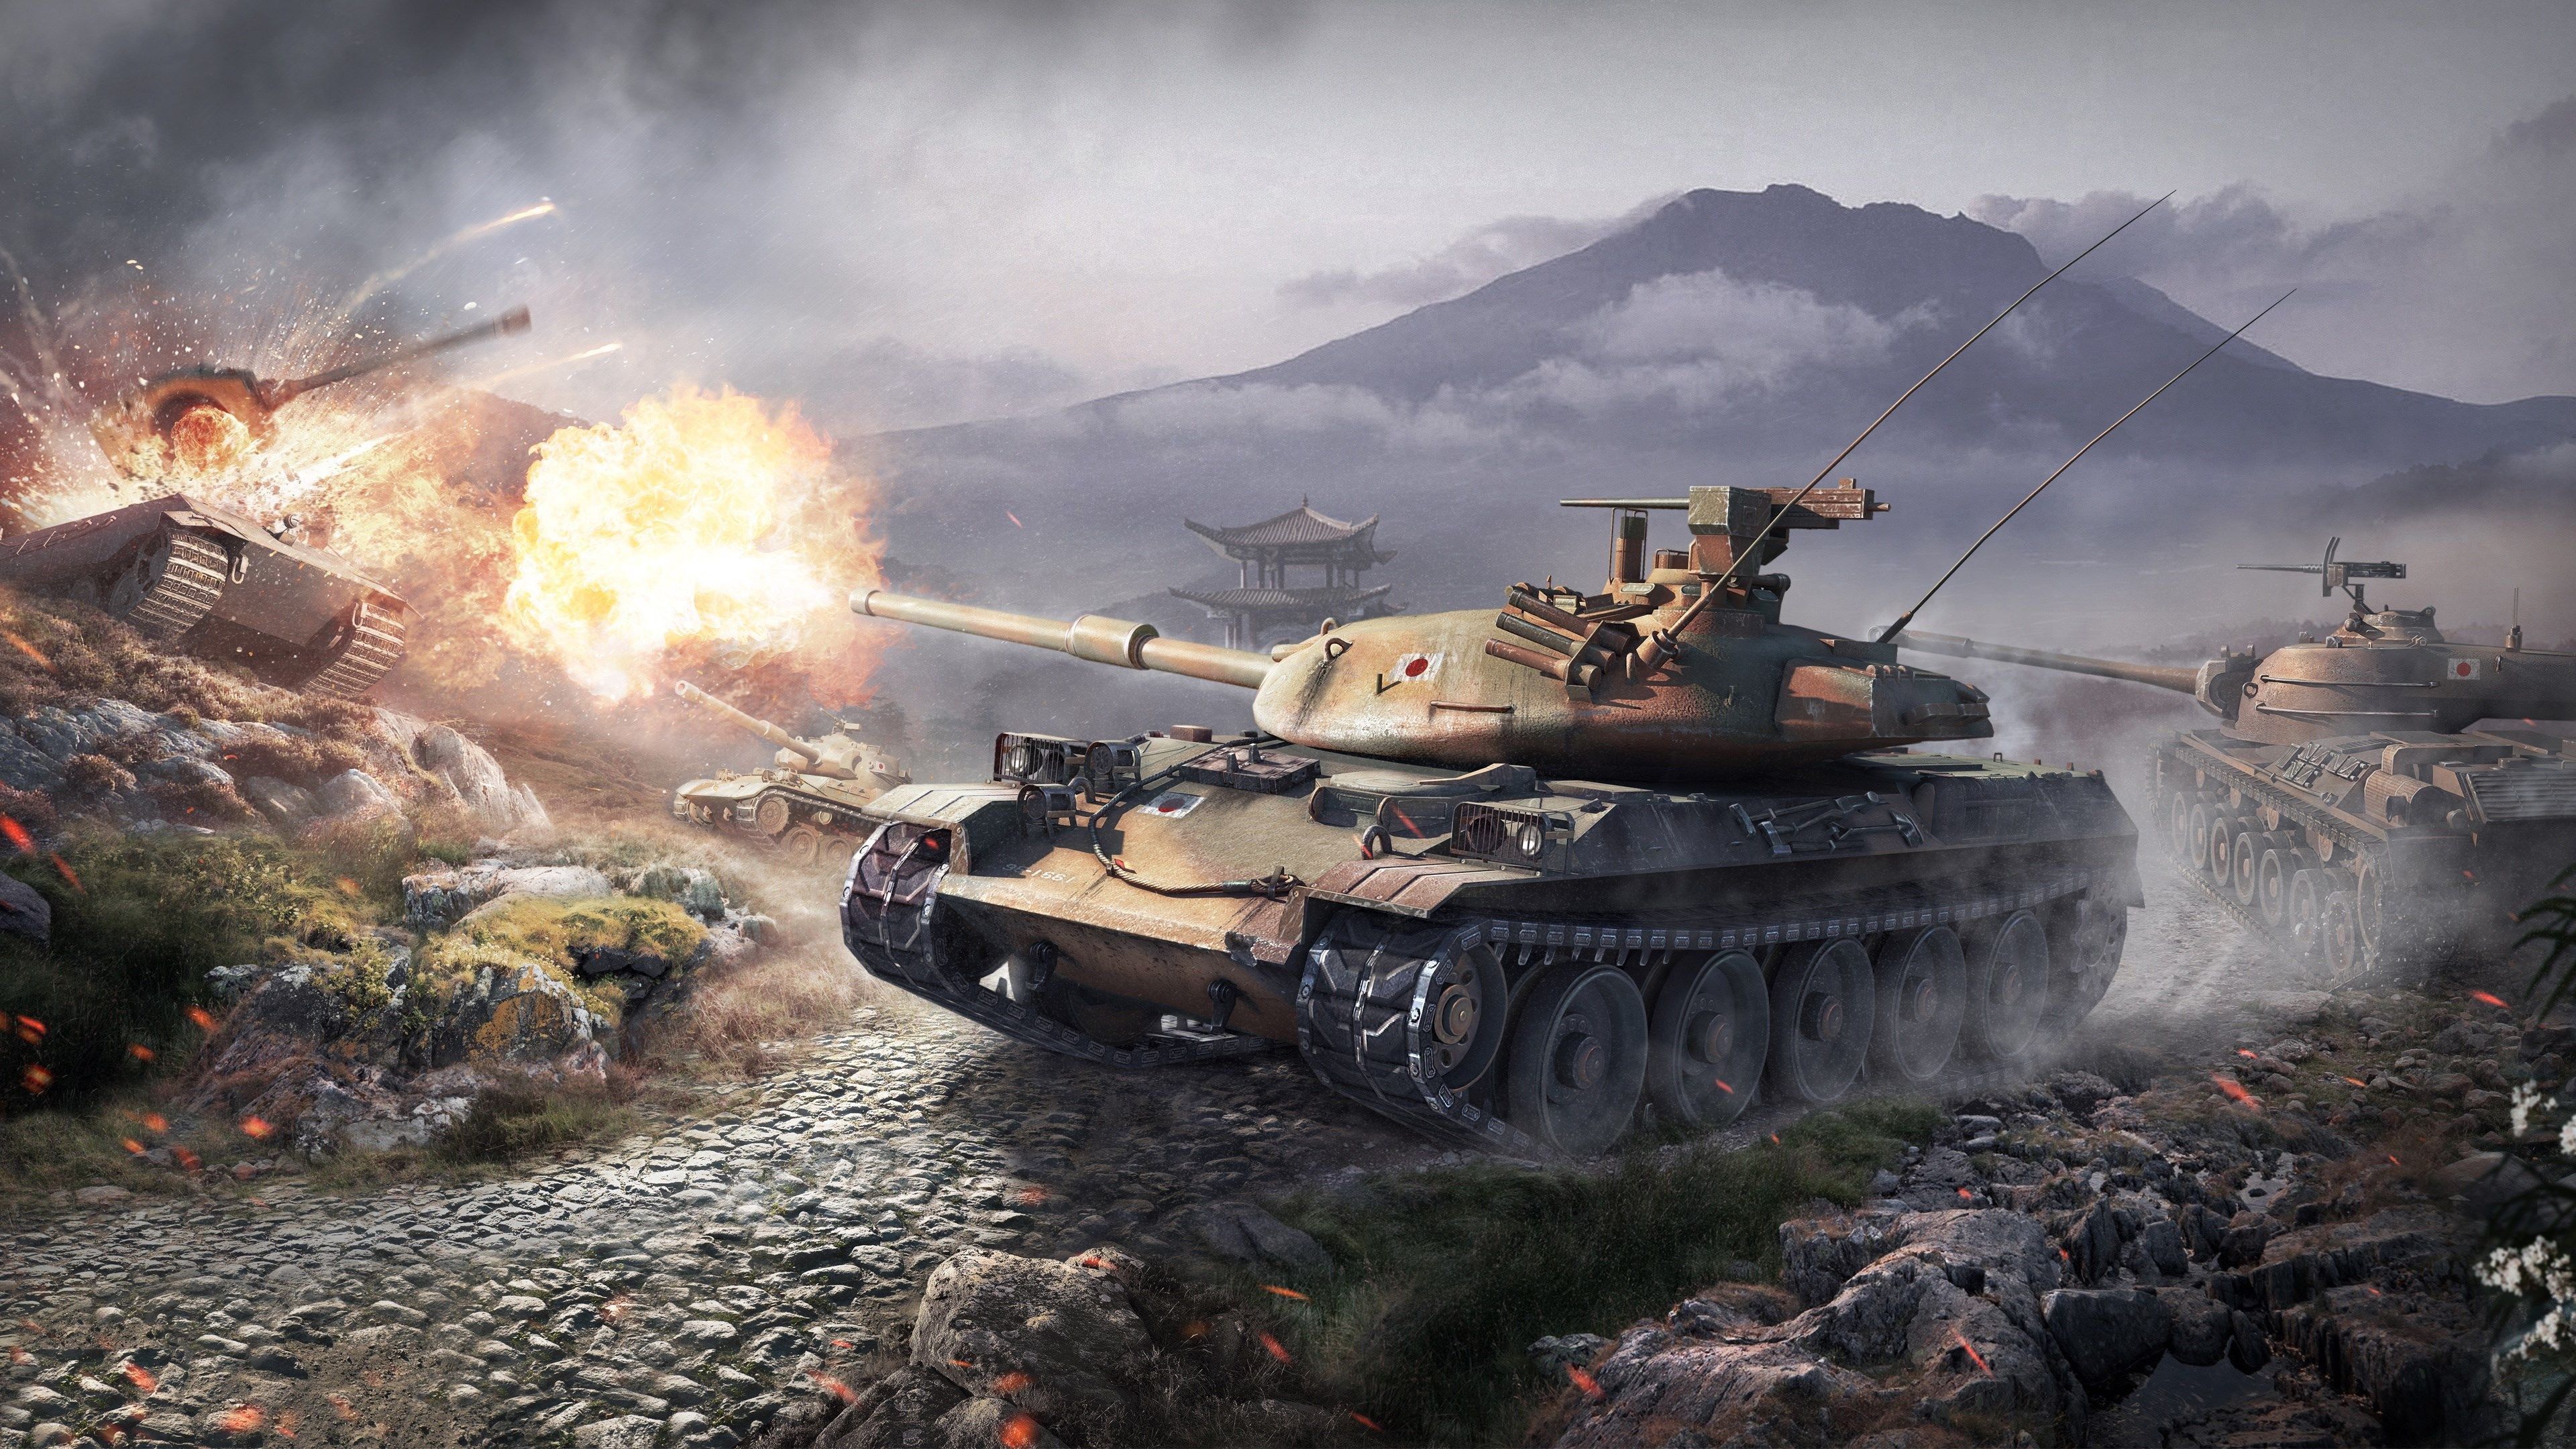 World Of Tanks Hd Wallpaper Igry Tank Voennyj